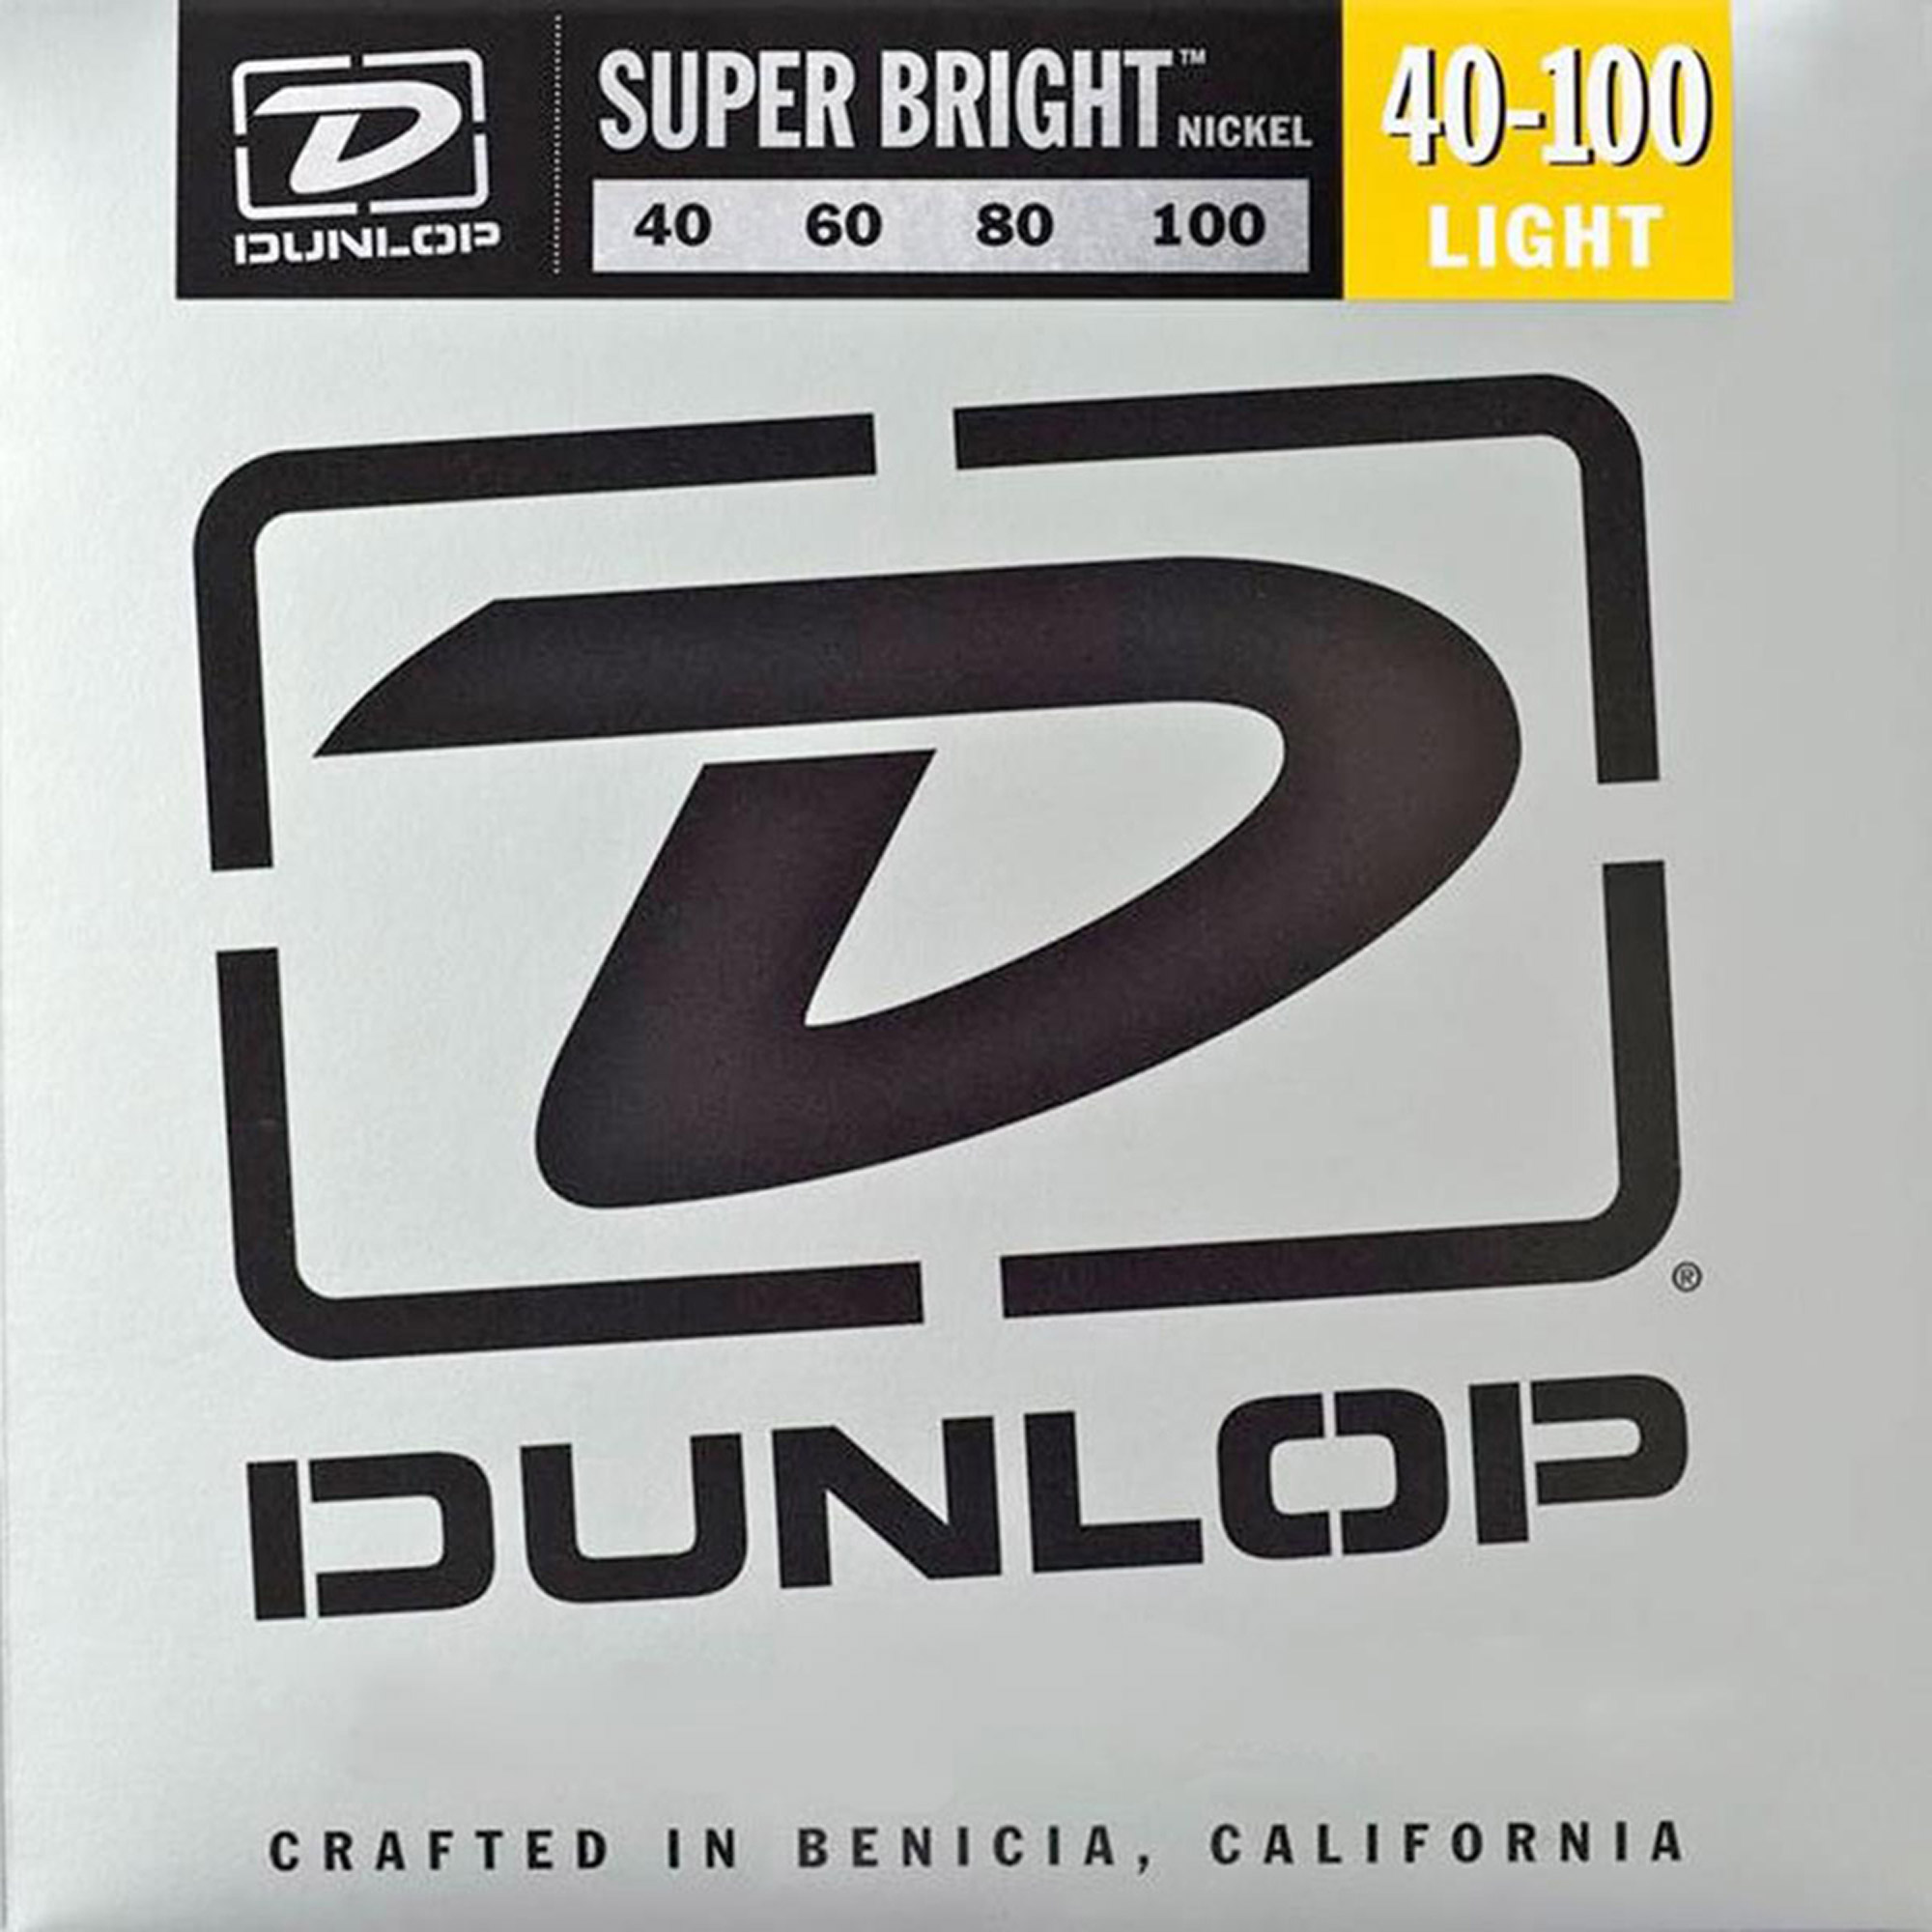 Dunlop DBSBN40100 Super Bright Nickel-Plated Steel Bass 4 String Set, .40-.100 by Dunlop